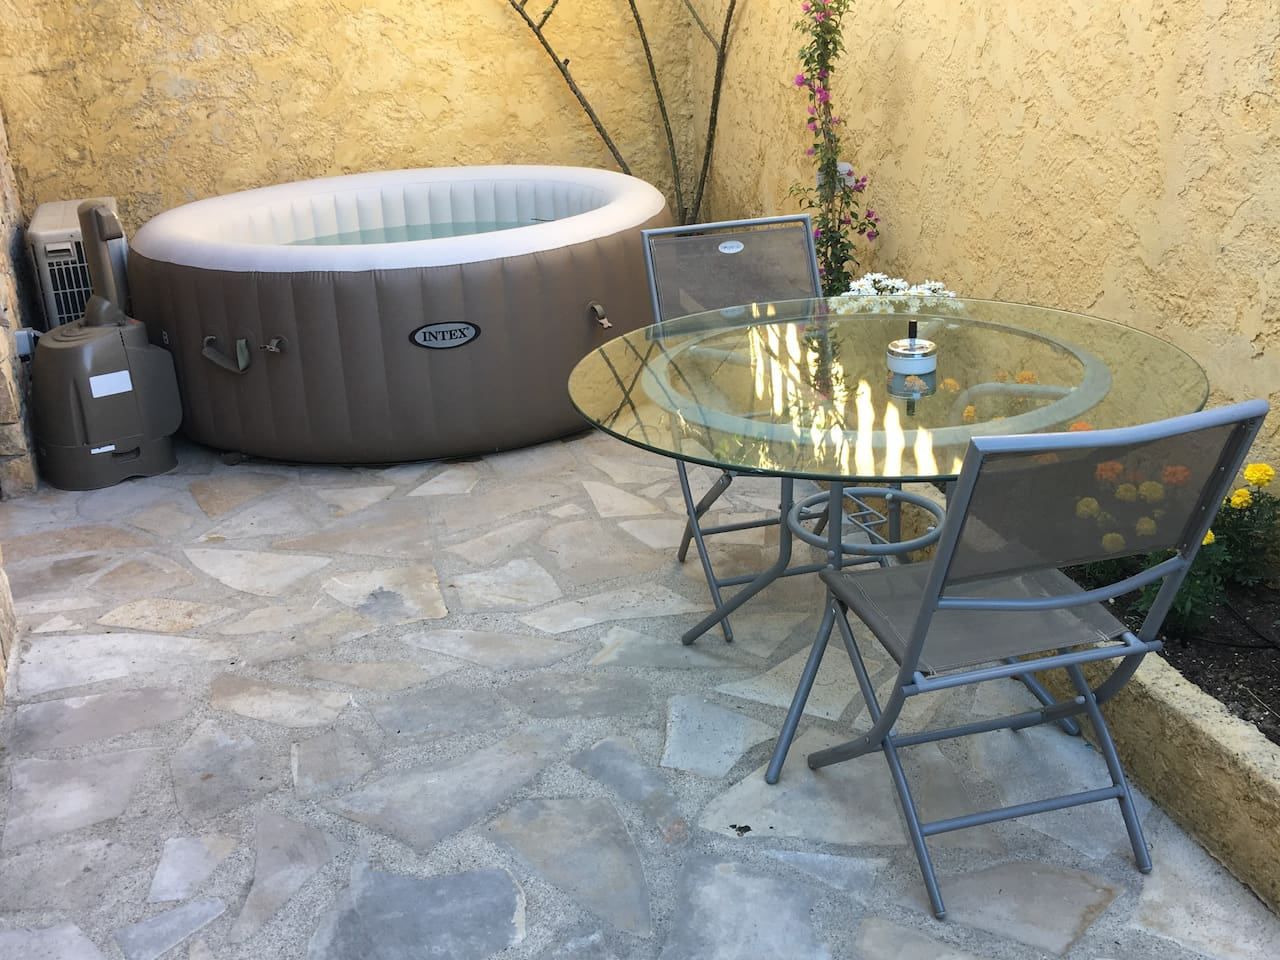 Salon de jardin et jacuzzi privatifs